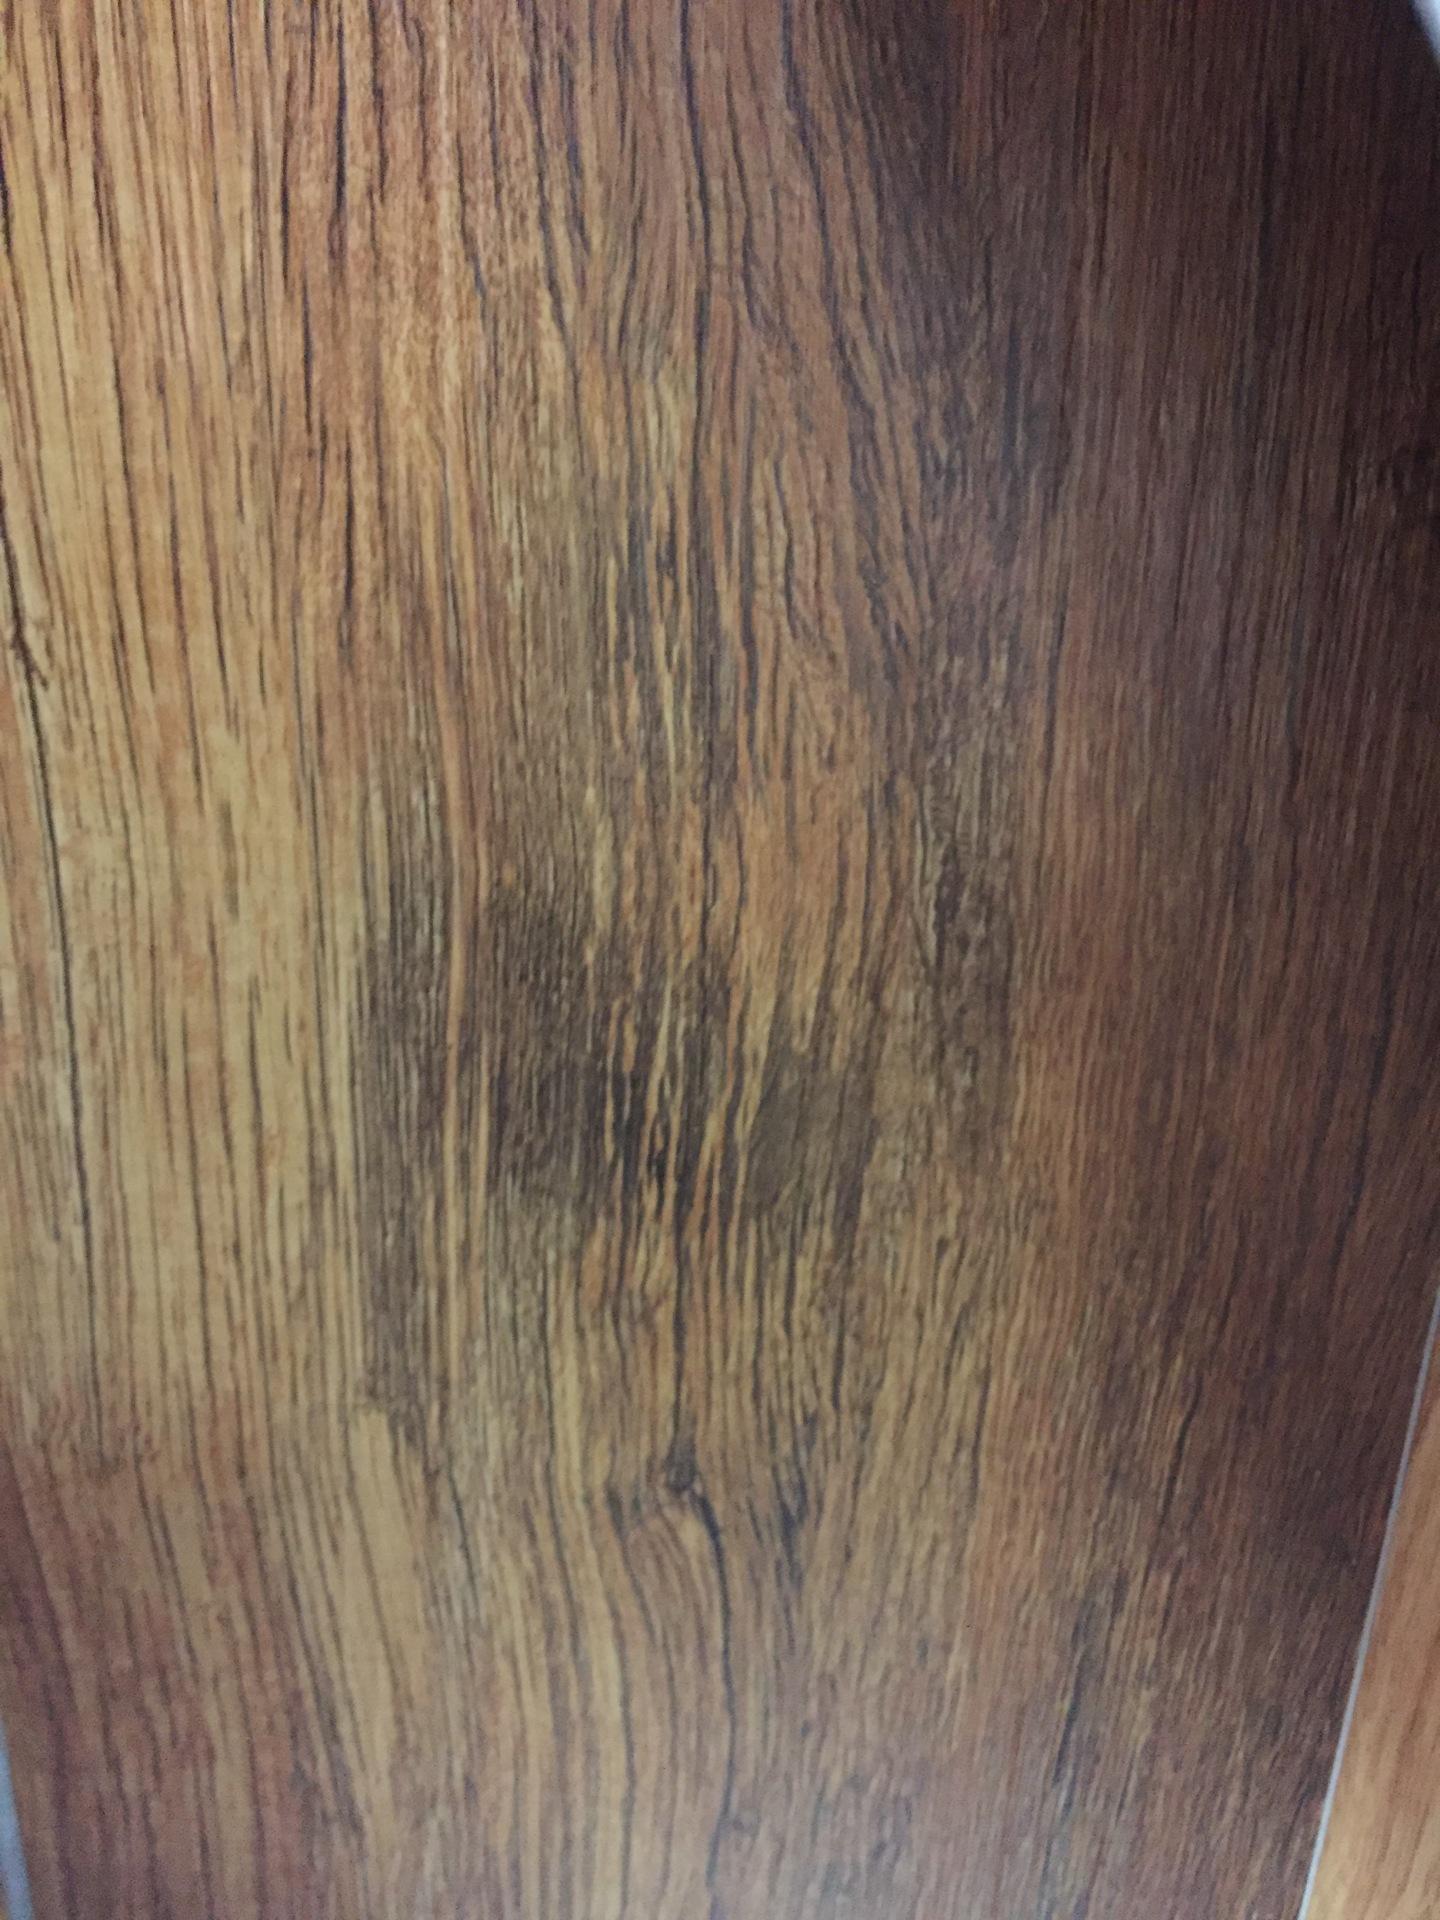 Cheney Eureka Cinnamon Oak- $2.79 sq. ft.